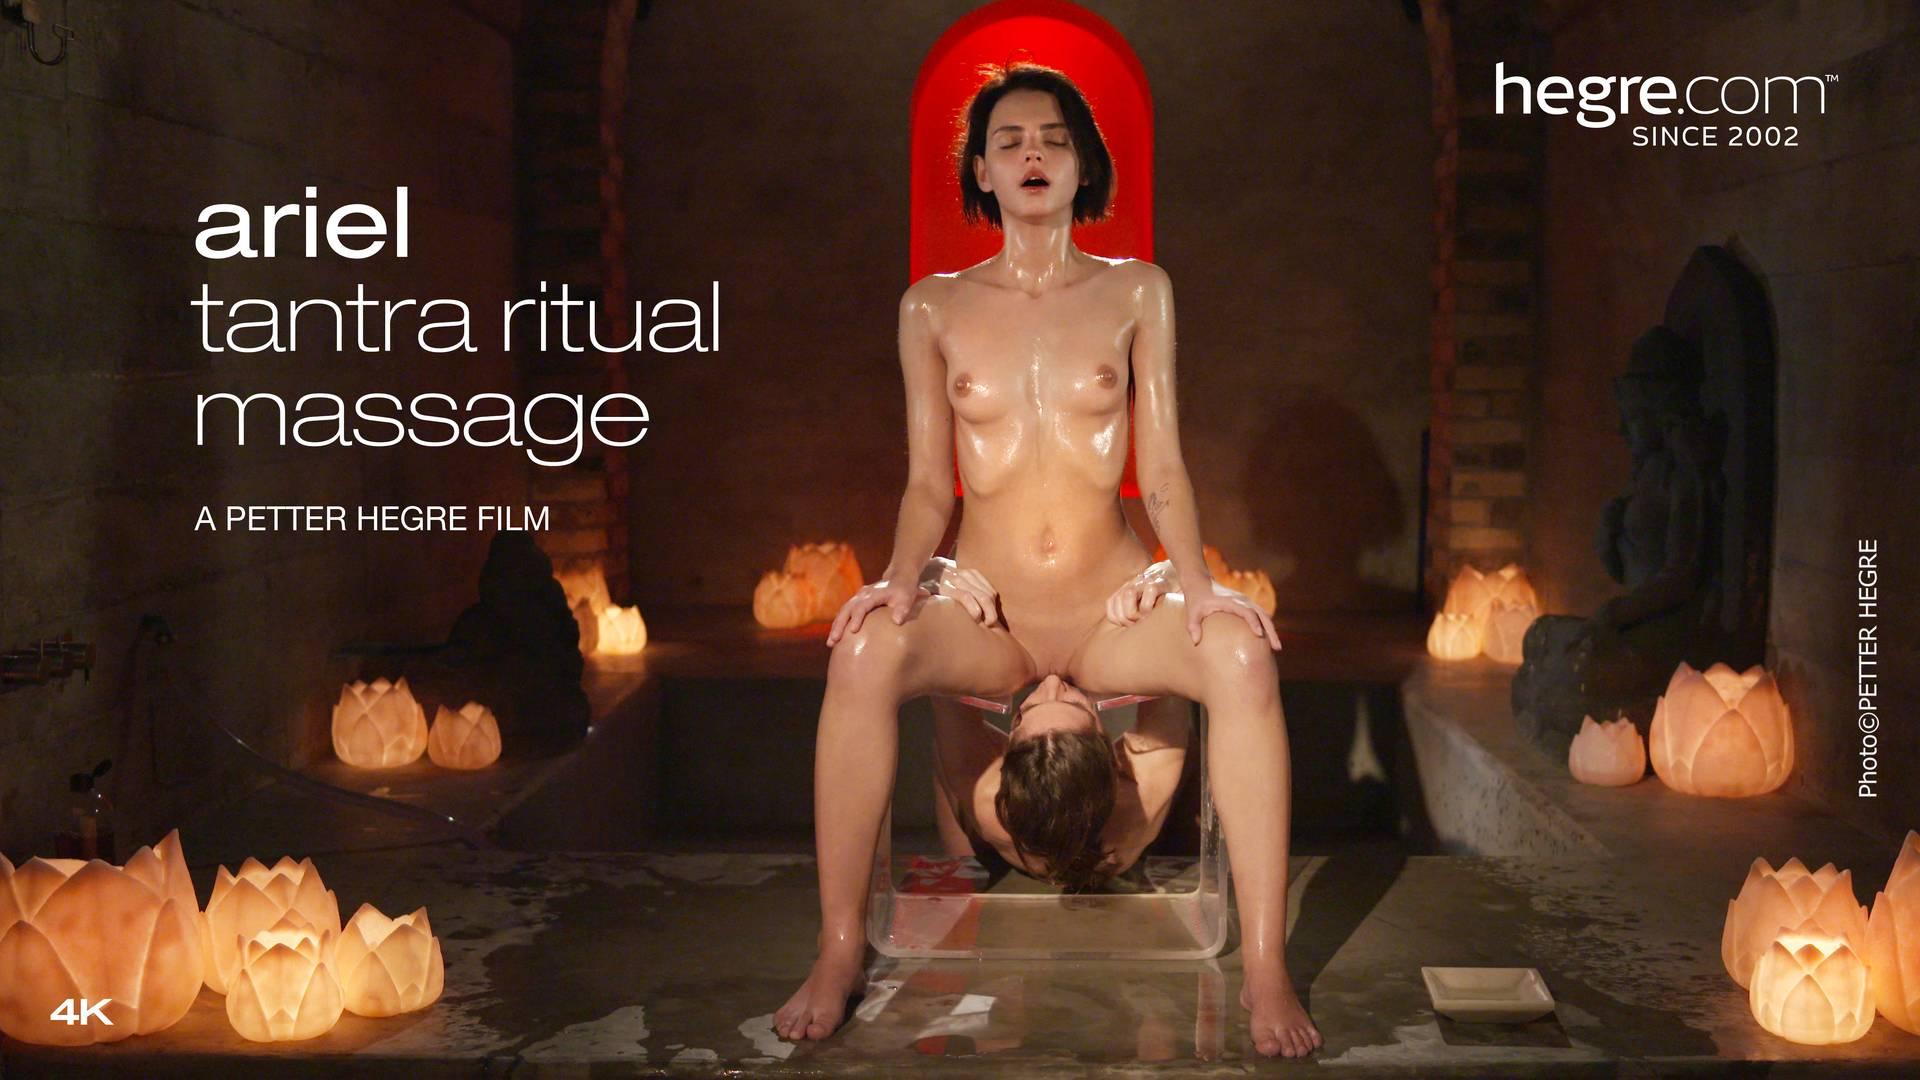 erotische penis massage utube sex films